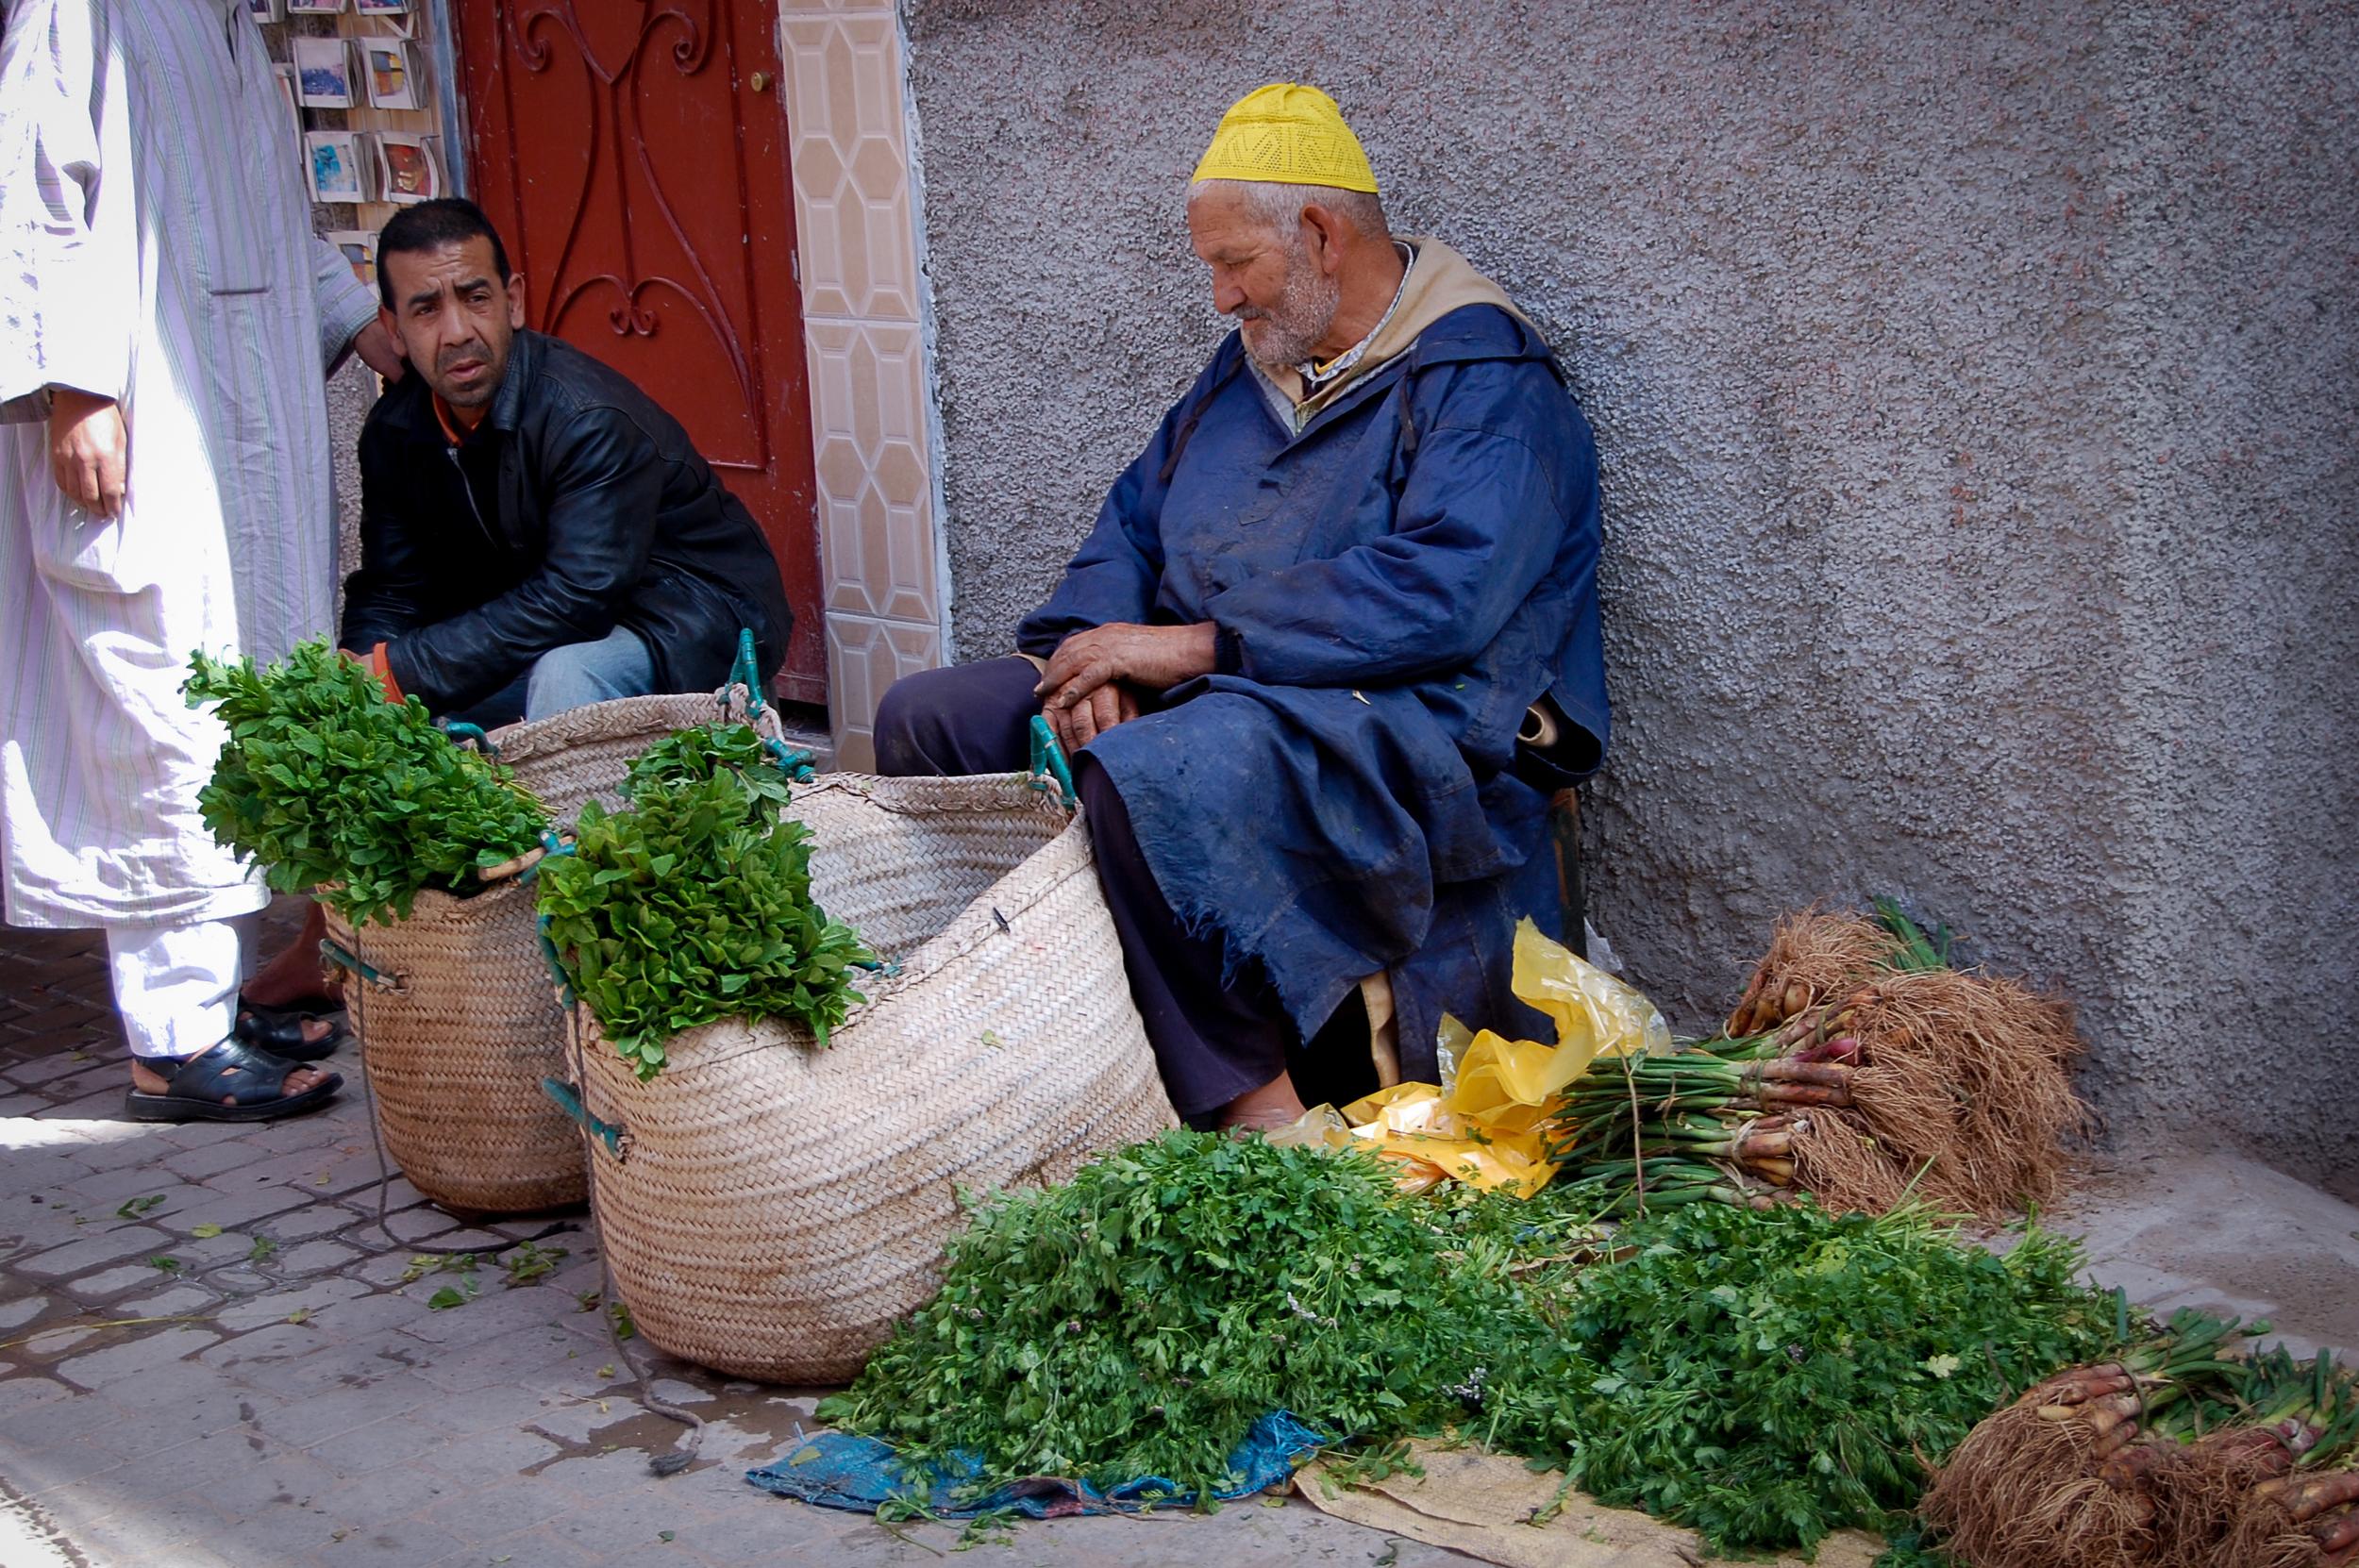 morocco (17 of 39).jpg